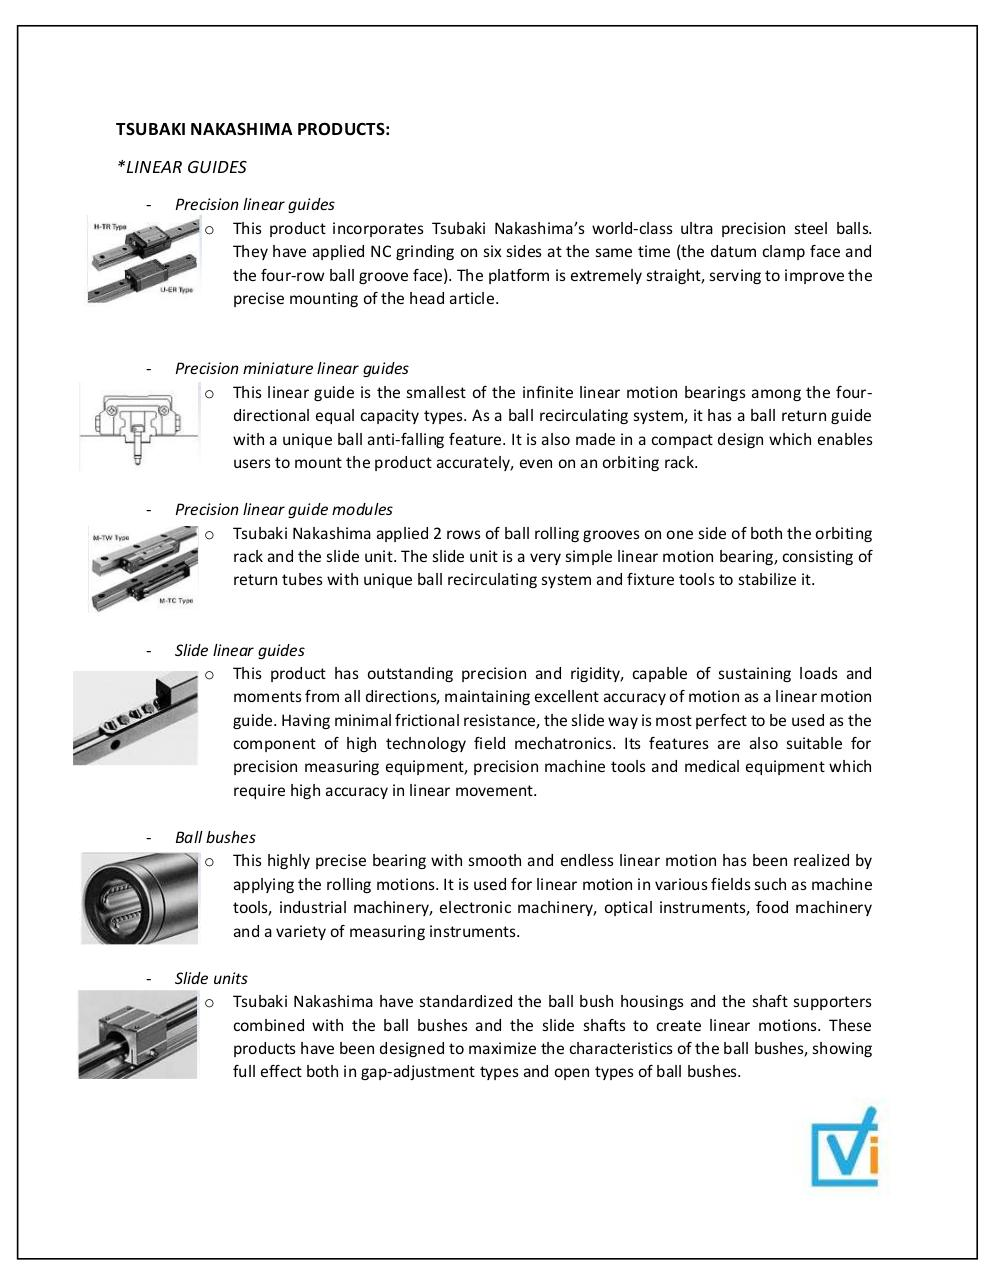 PDF PRESENTATION TN par user - Fichier PDF